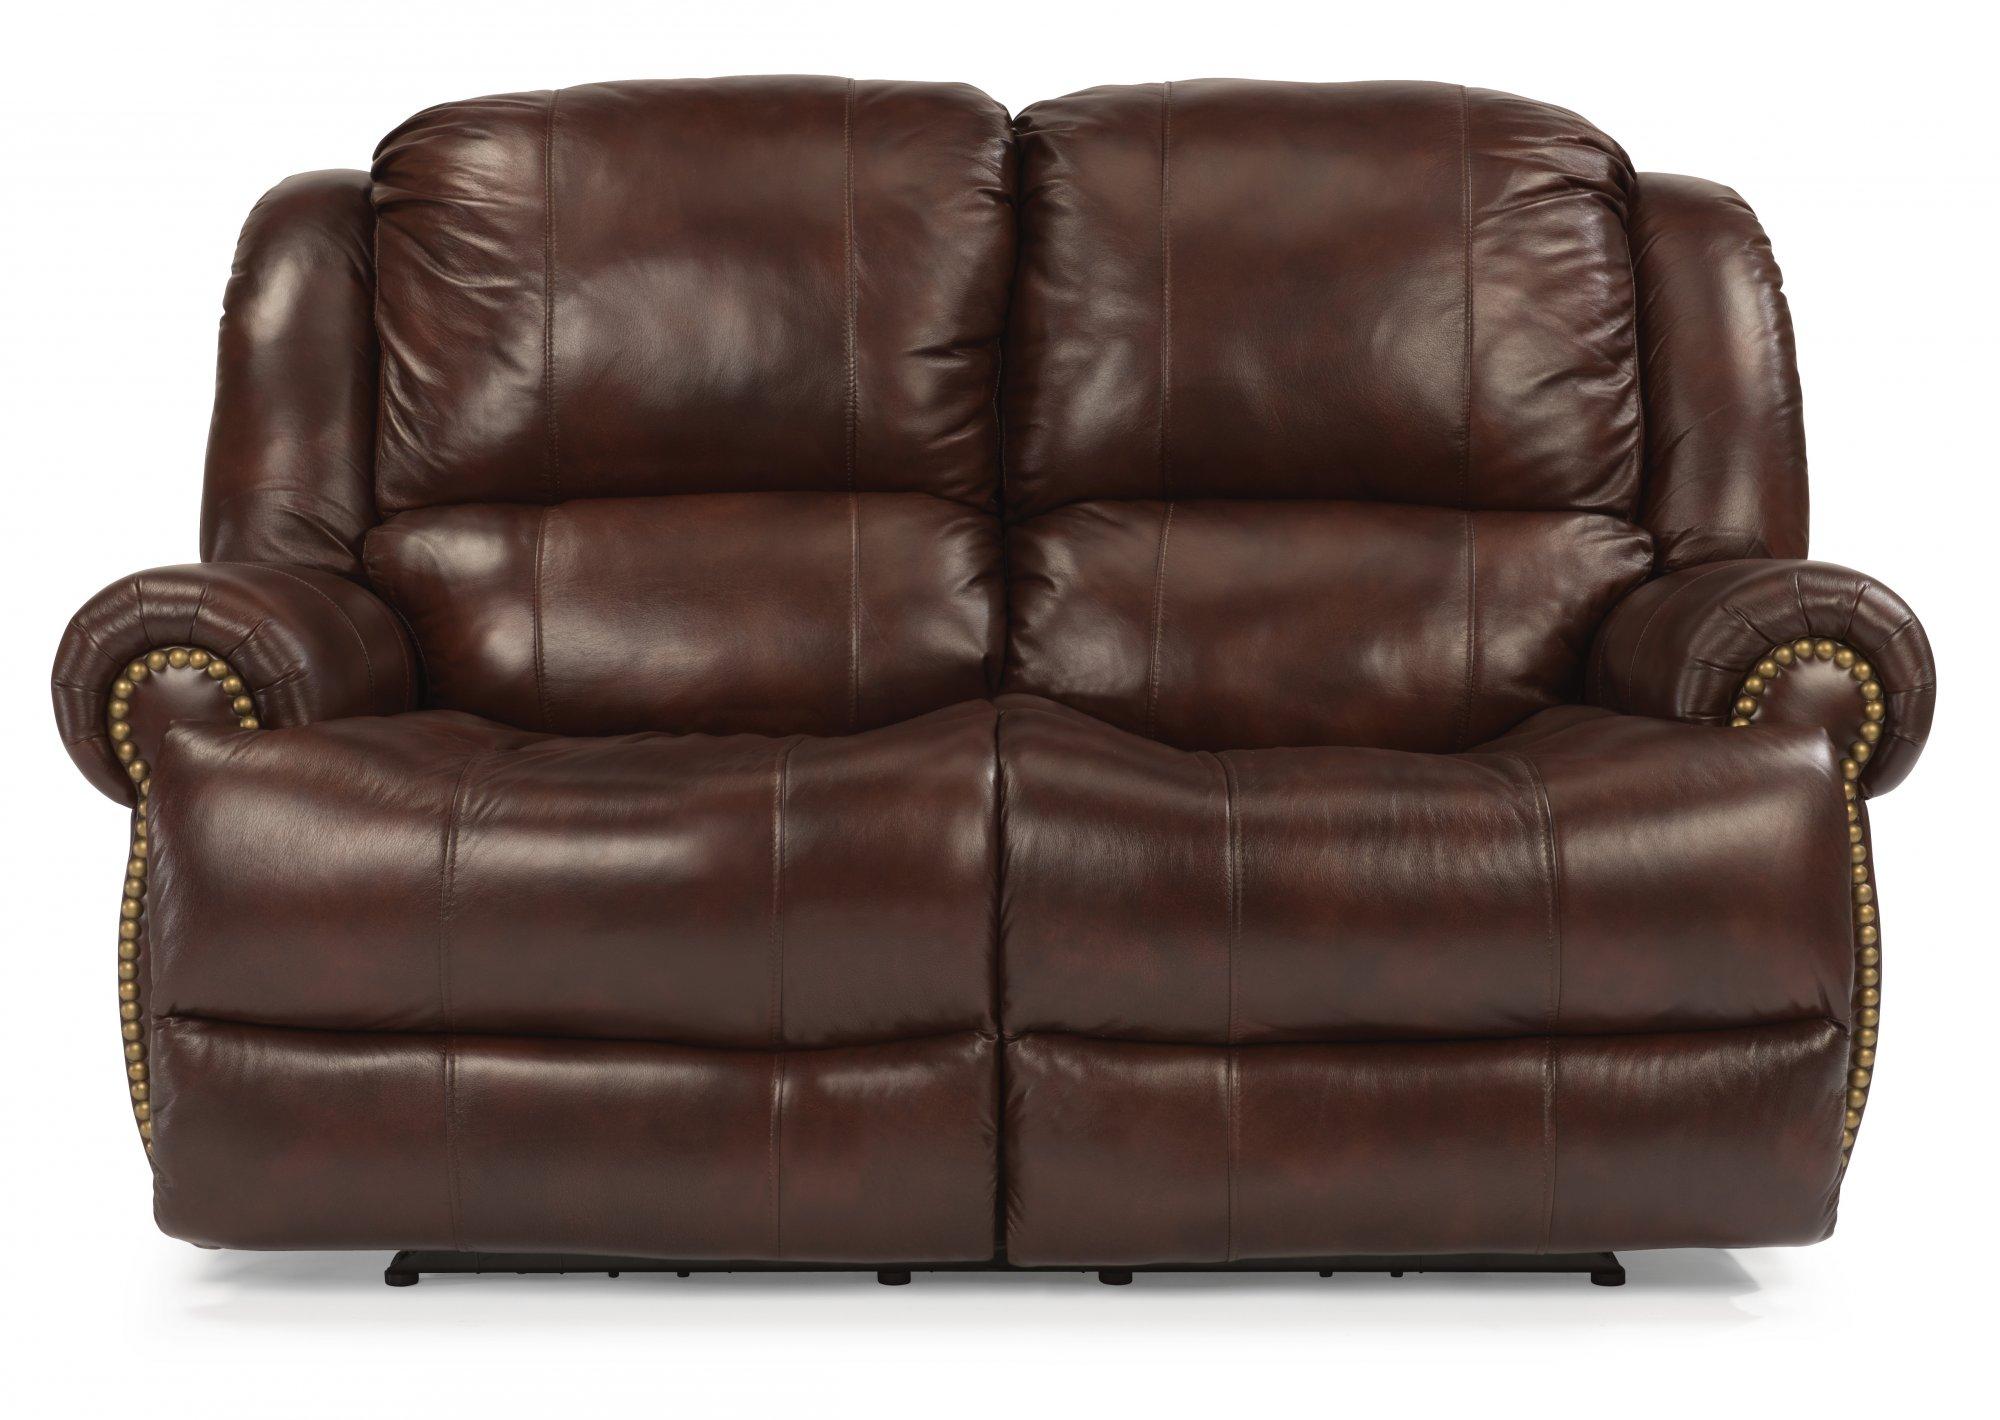 Fantastic Flexsteel 1311 60P Capitol Leather Power Reclining Machost Co Dining Chair Design Ideas Machostcouk